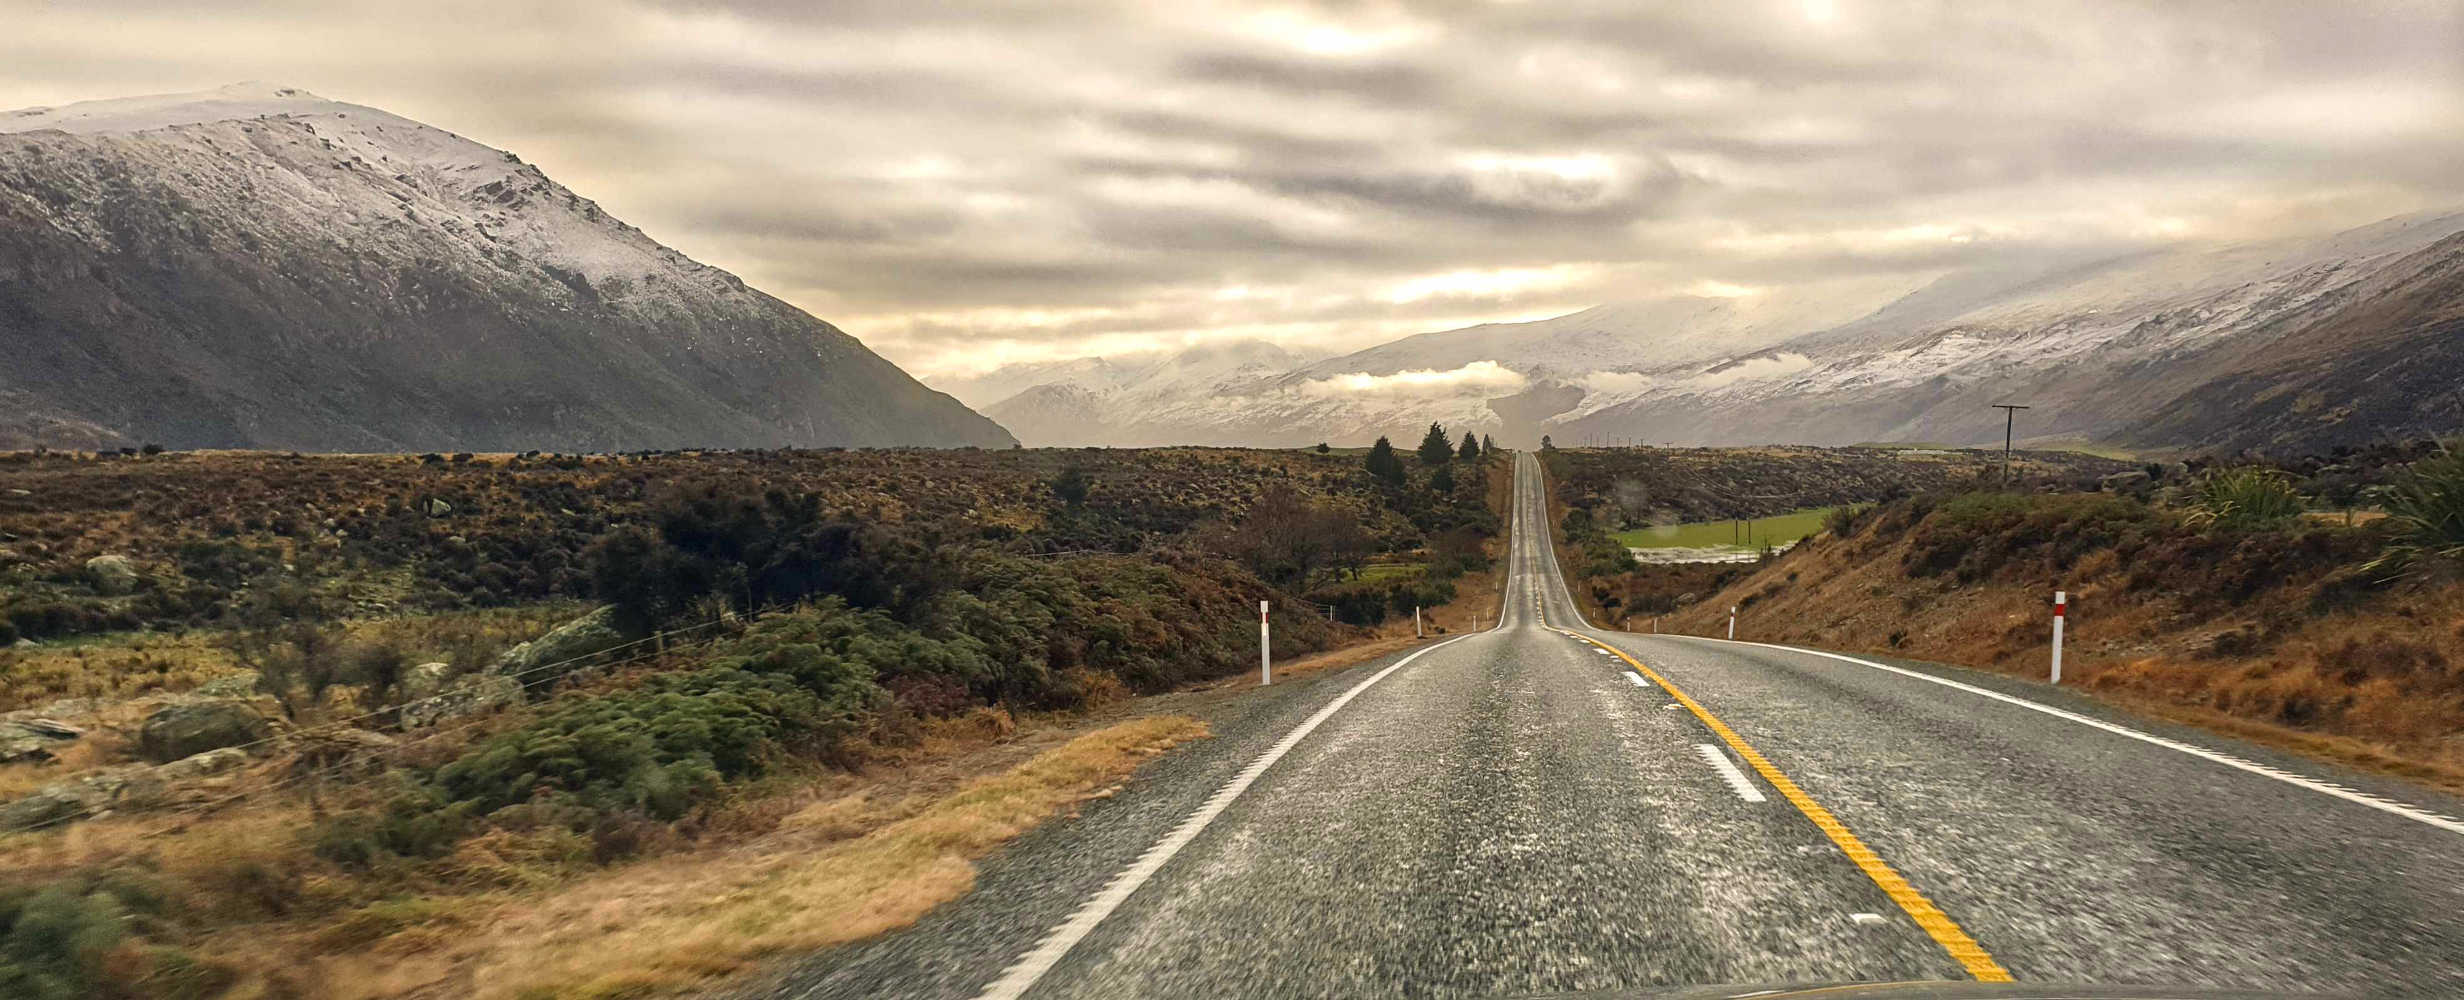 Invercargill to Queenstown winter views,New Zealand